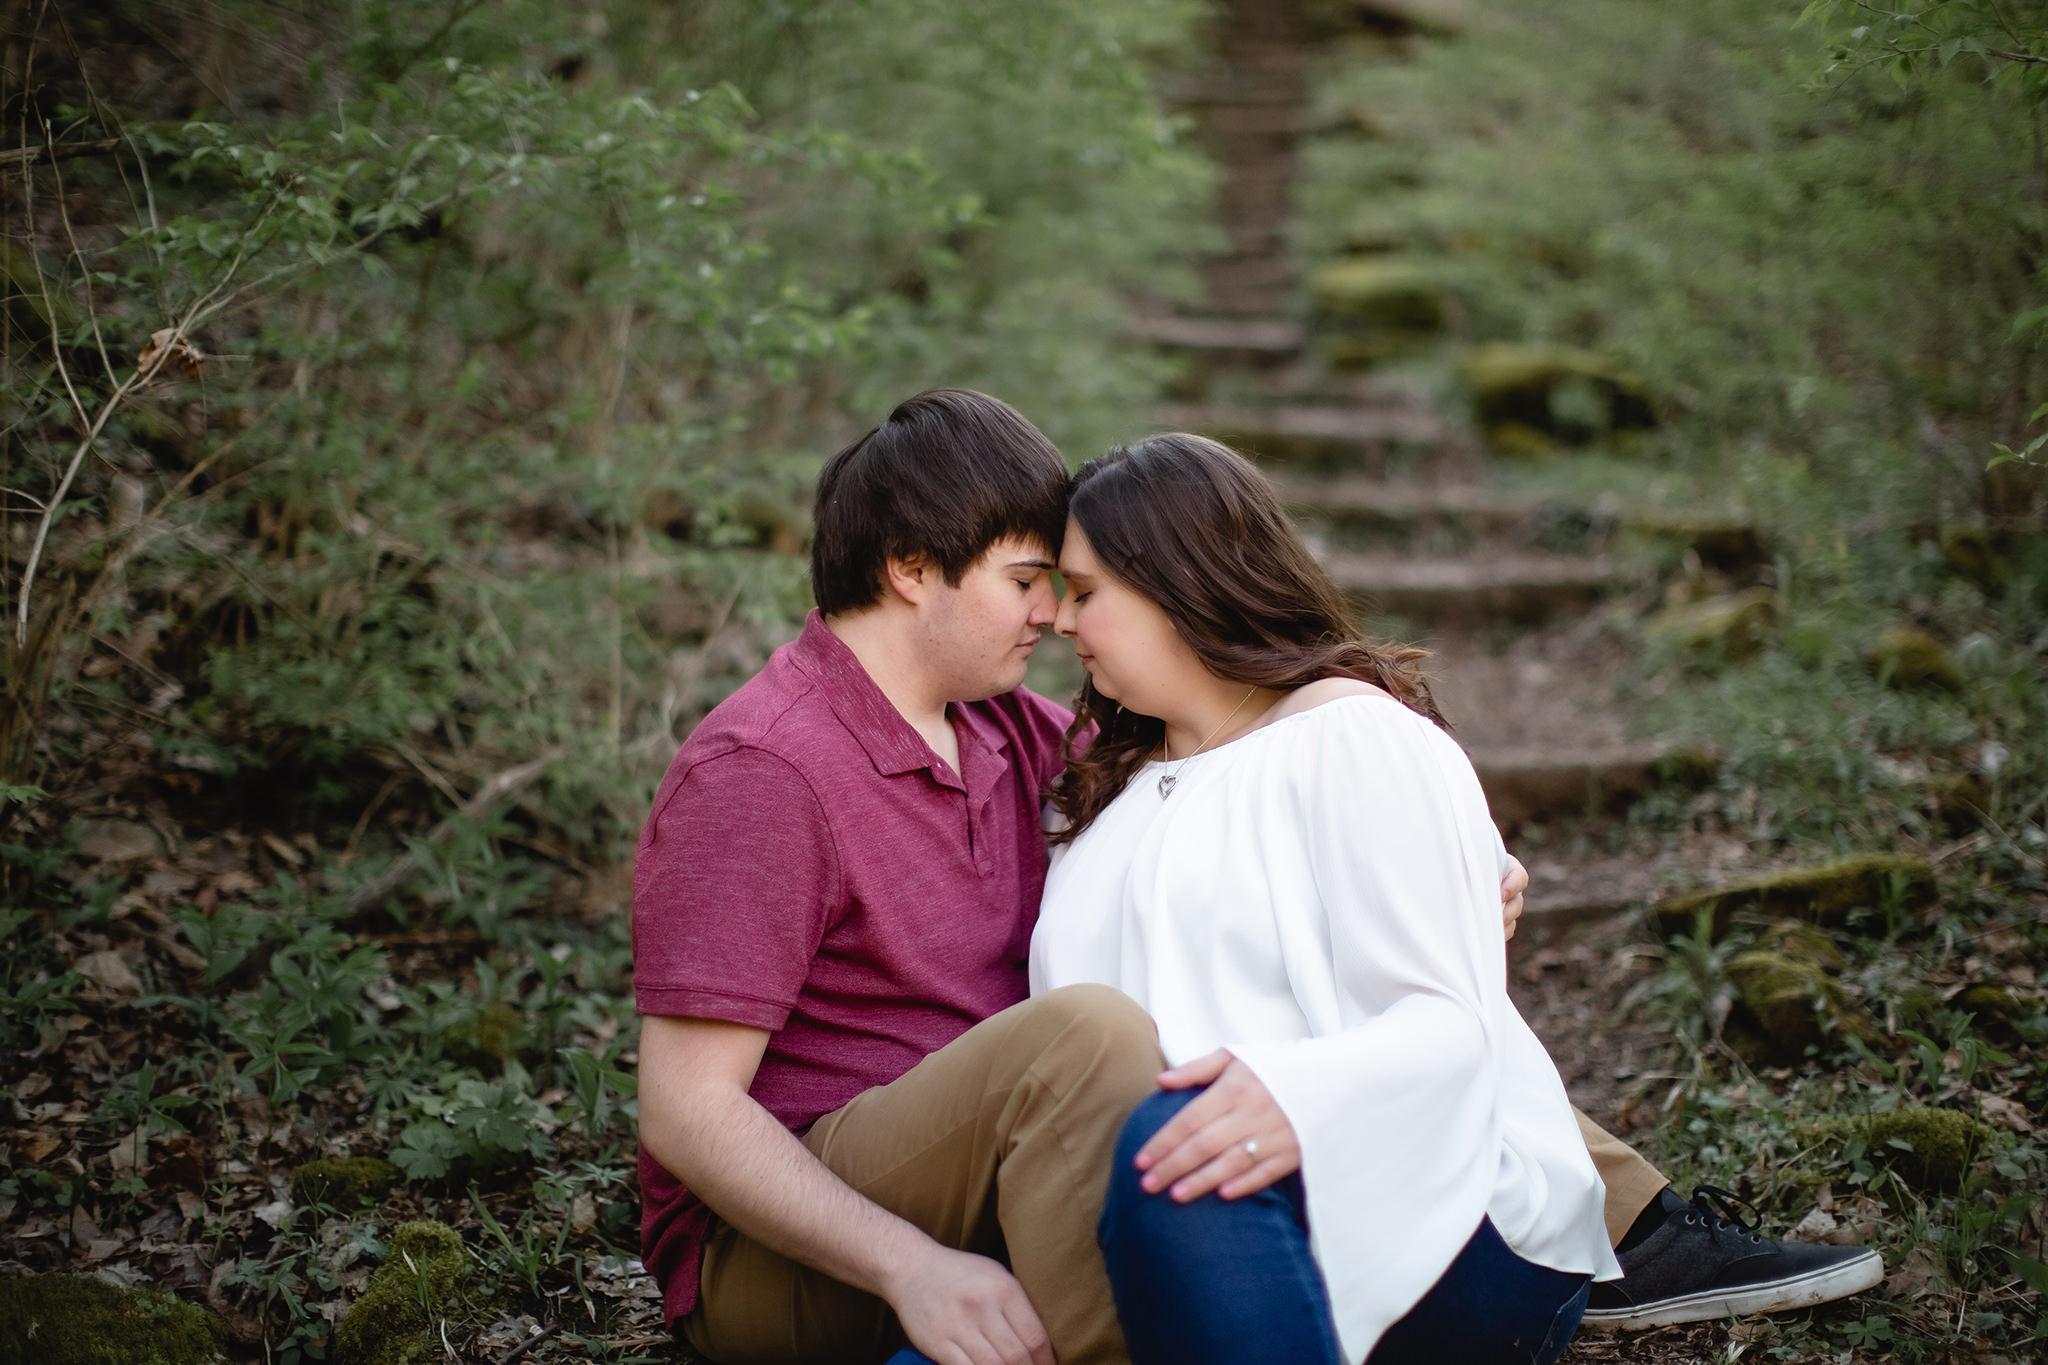 Dayton, Ohio, Photographer, Near me, Yellow Springs, Engagement, session, outdoor, wedding, Cincinnati, Columbus